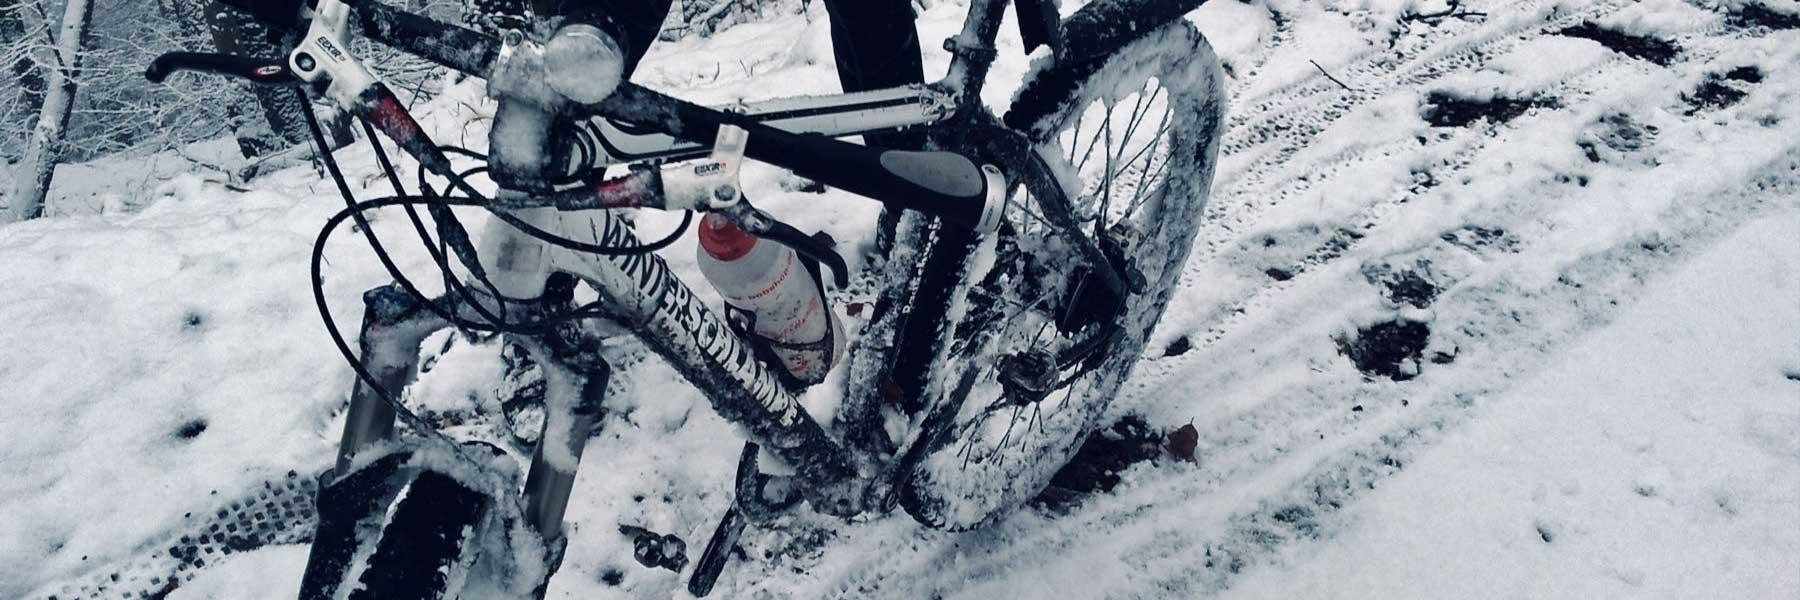 Winterpokal Image